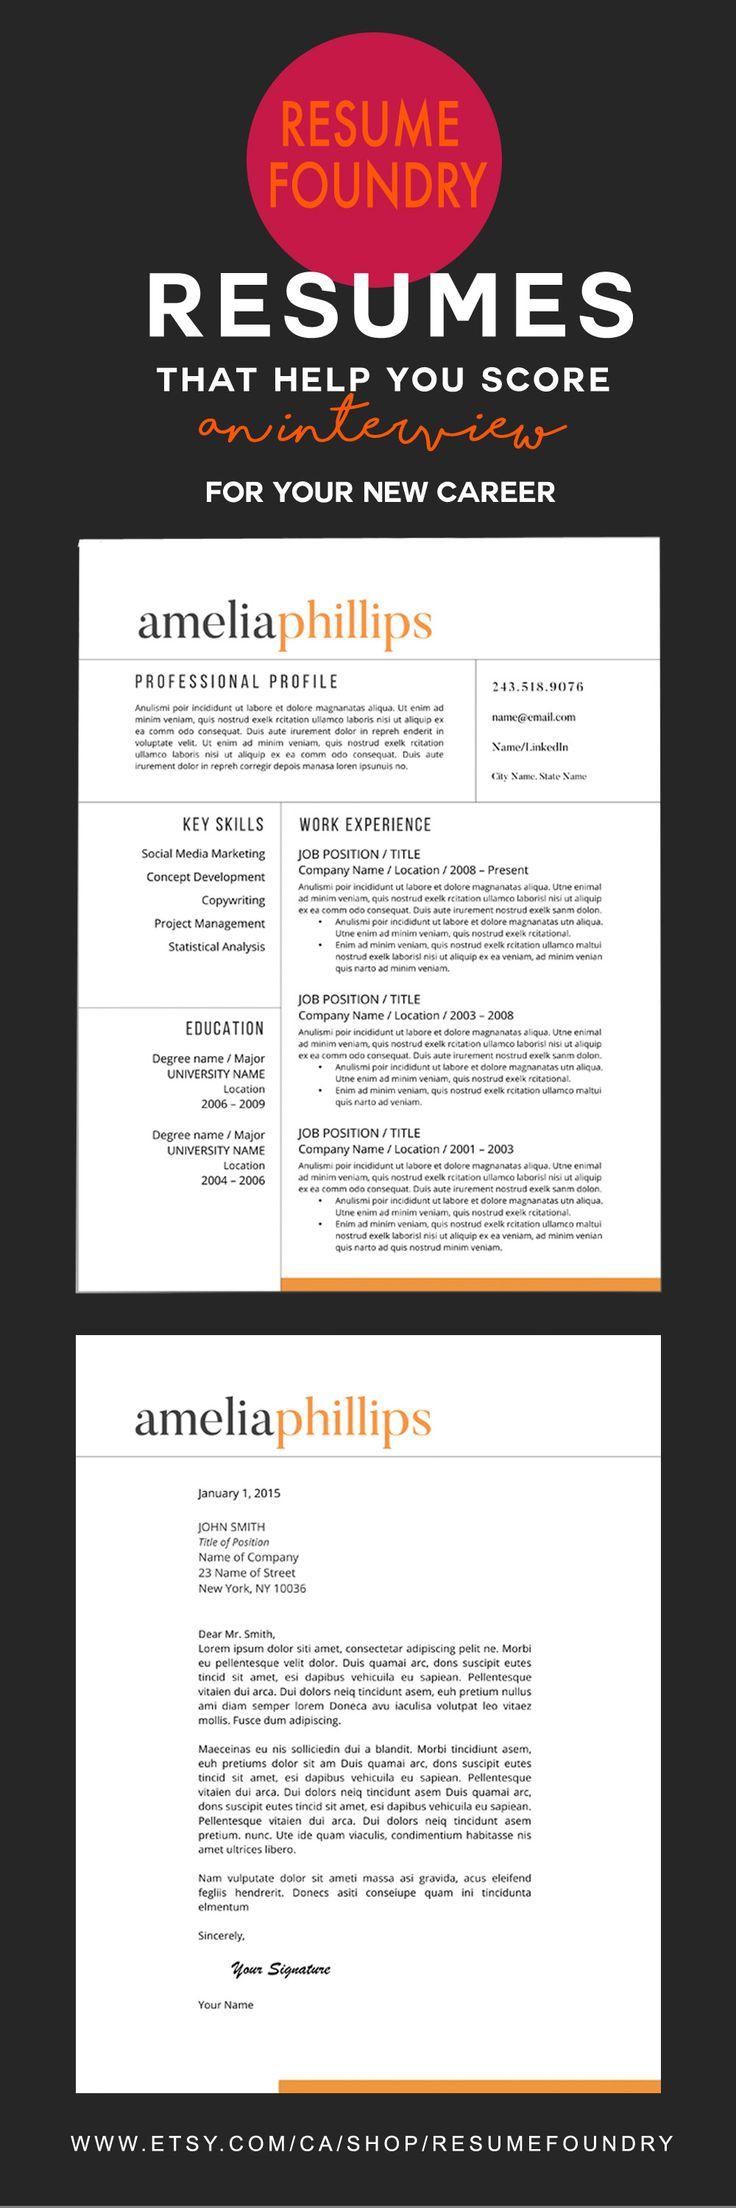 resume check resume check 4356